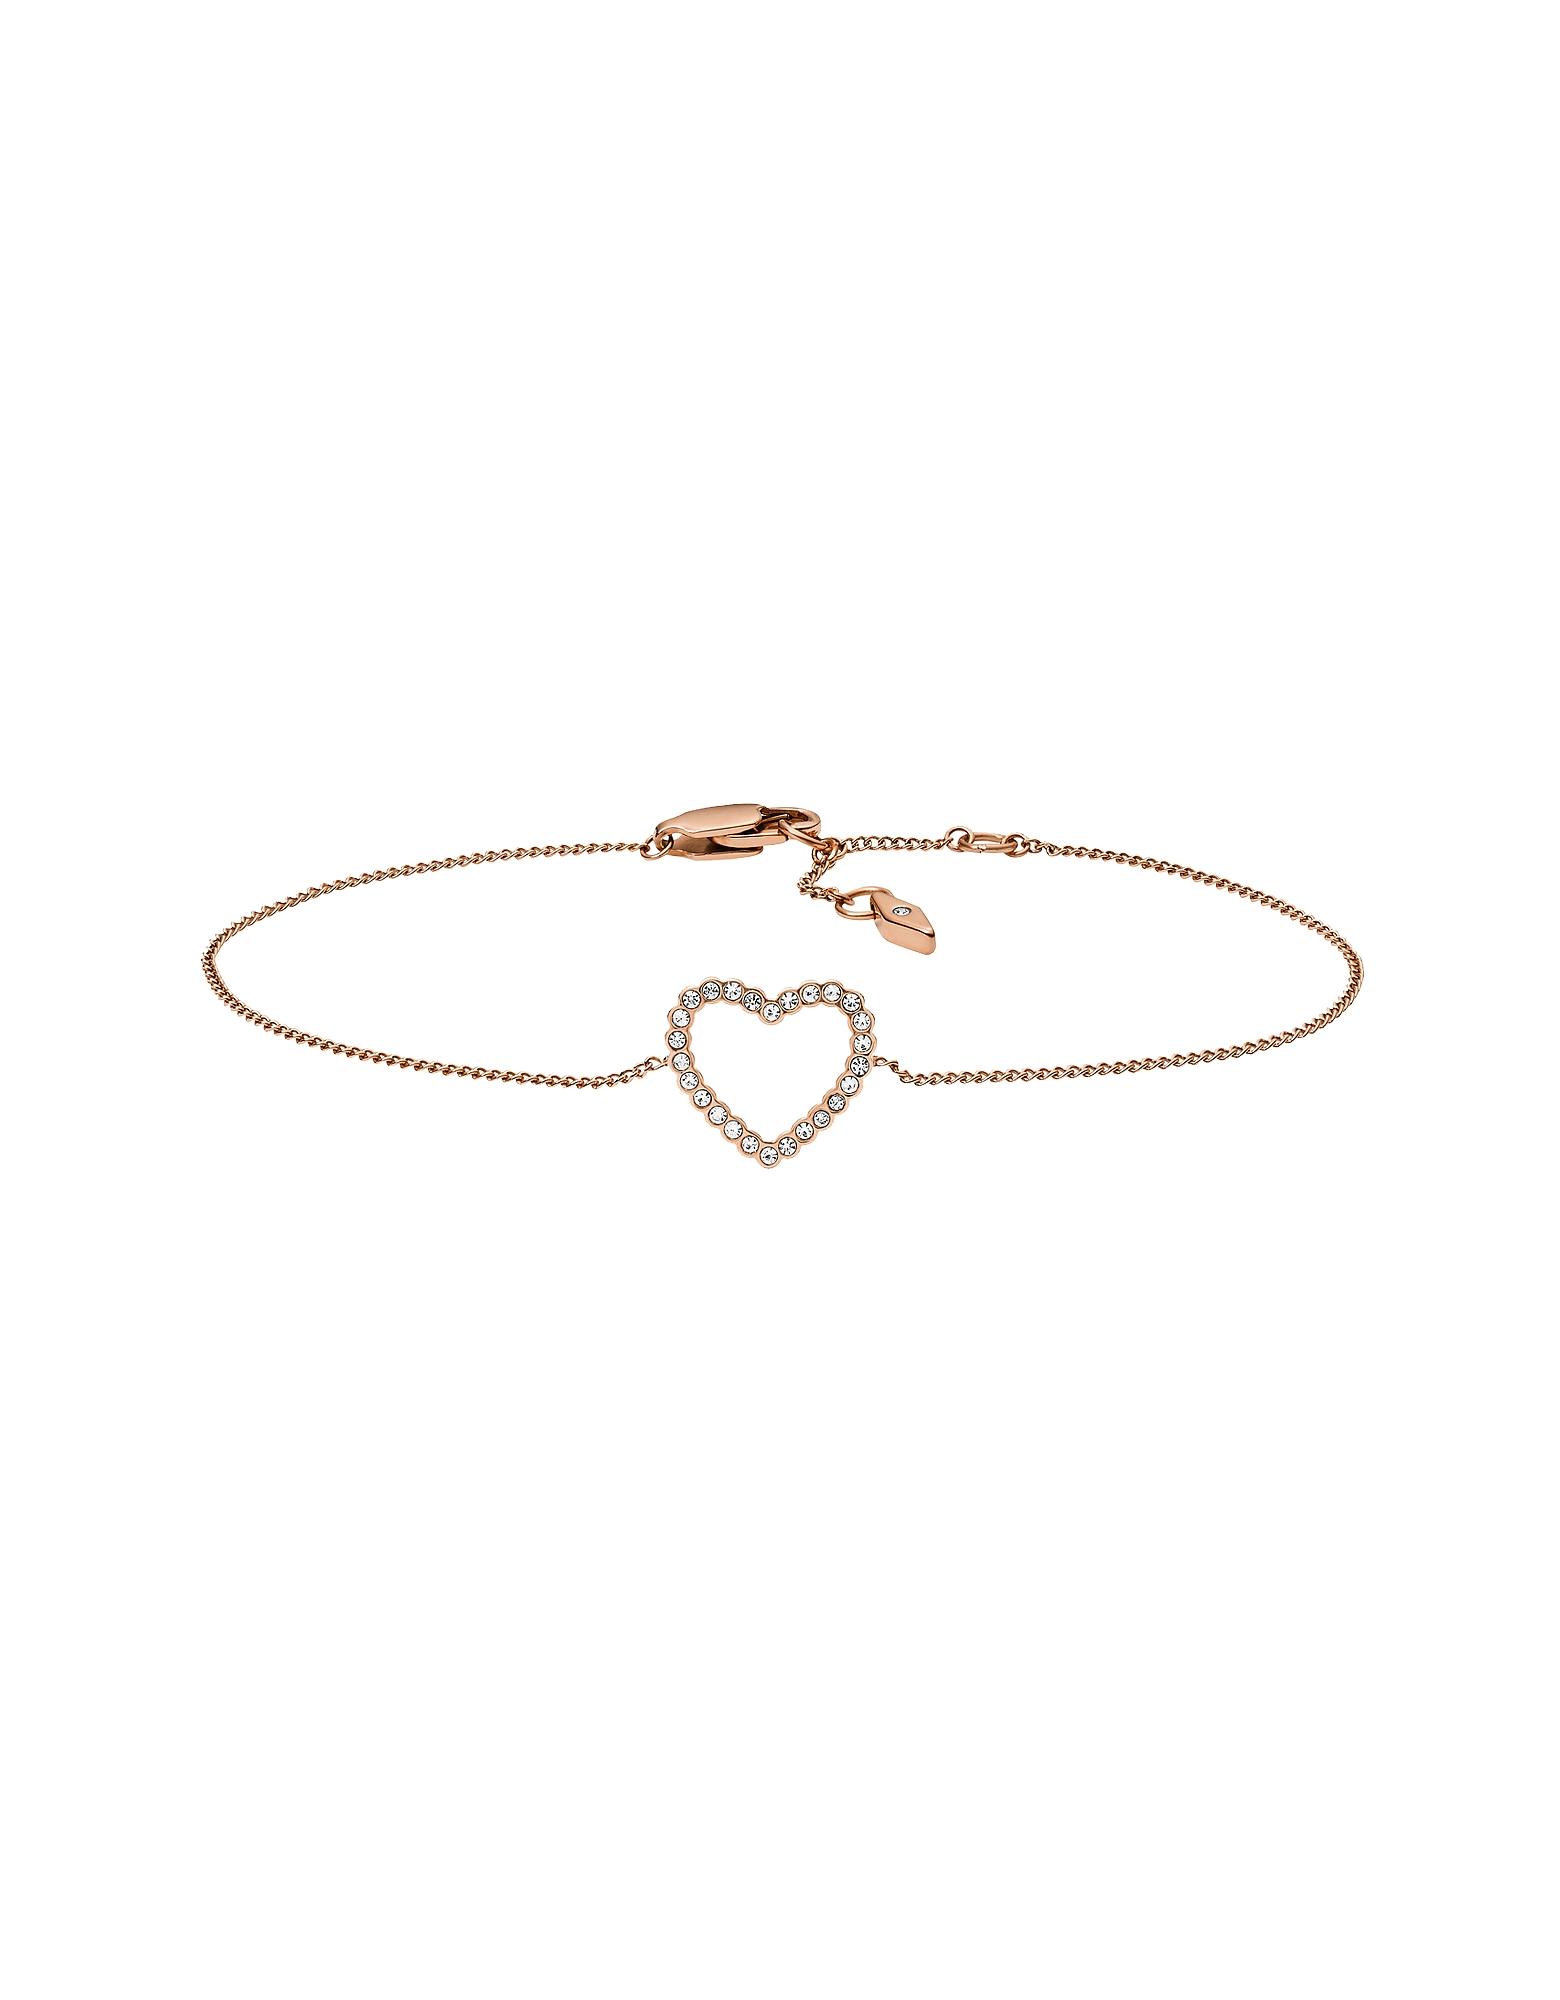 Fossil Designer Bracelets, Open Heart w/Crystals Bracelet